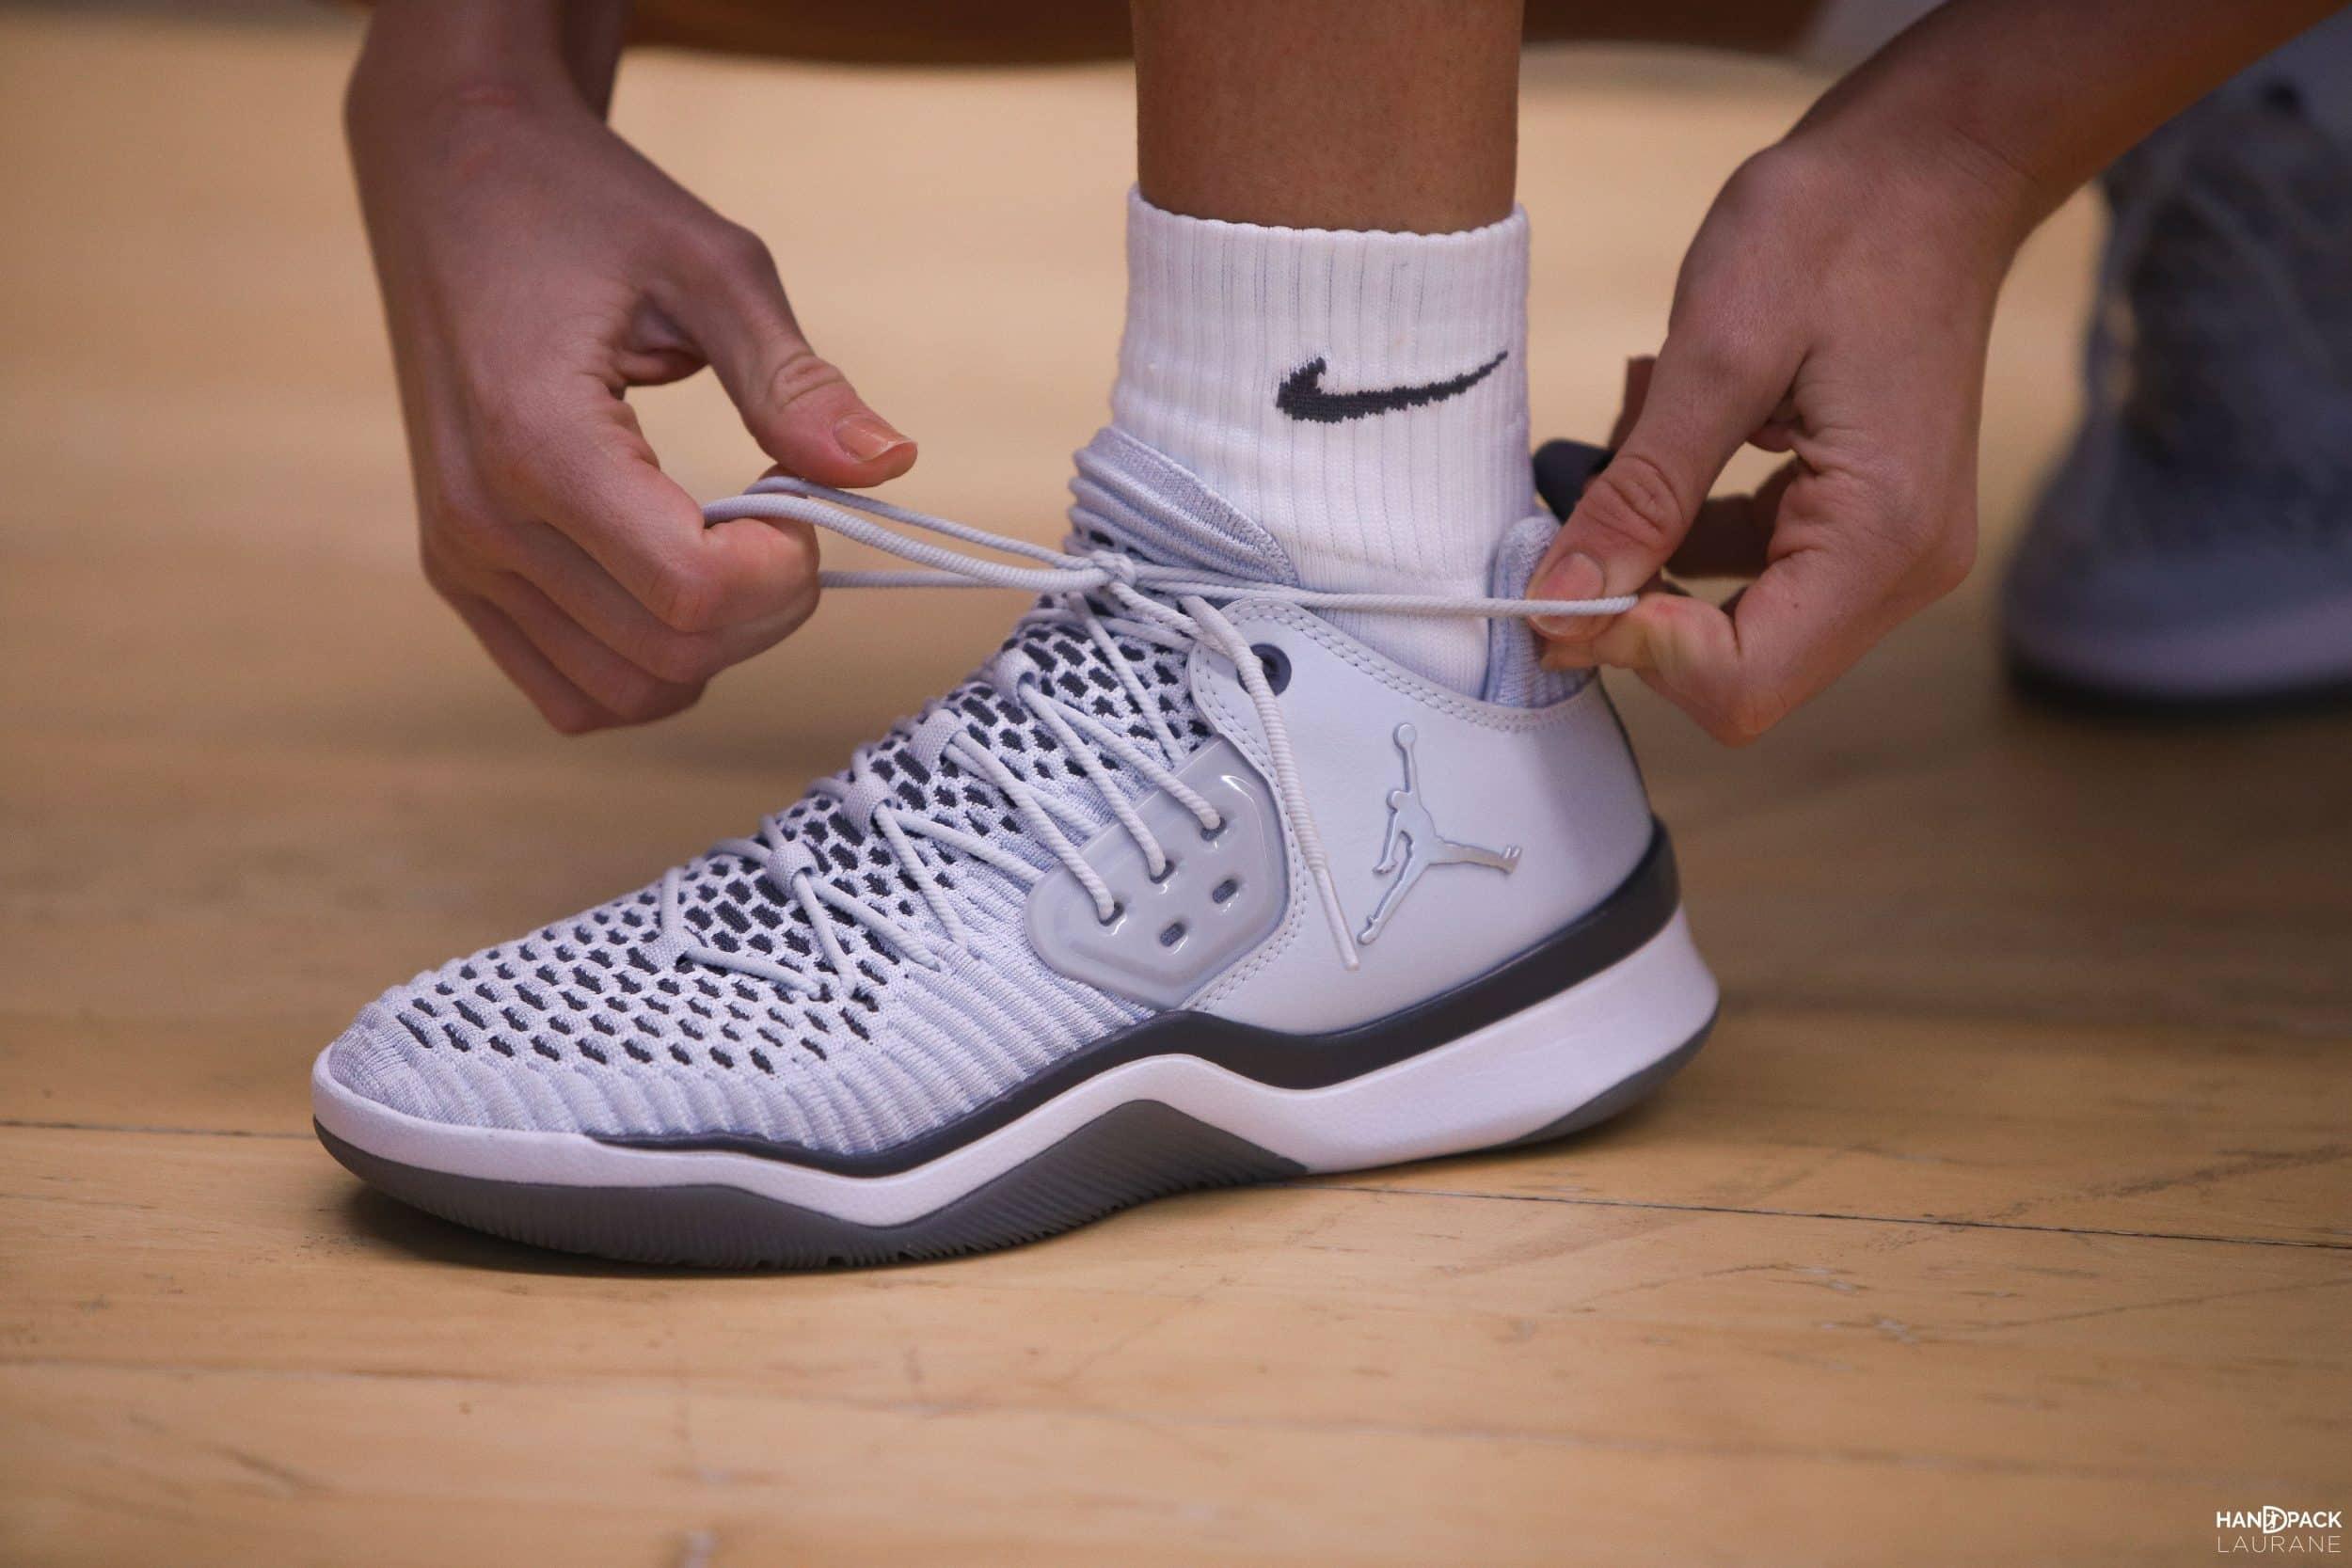 test-chaussures-jordan-dna-lx-handpack-8